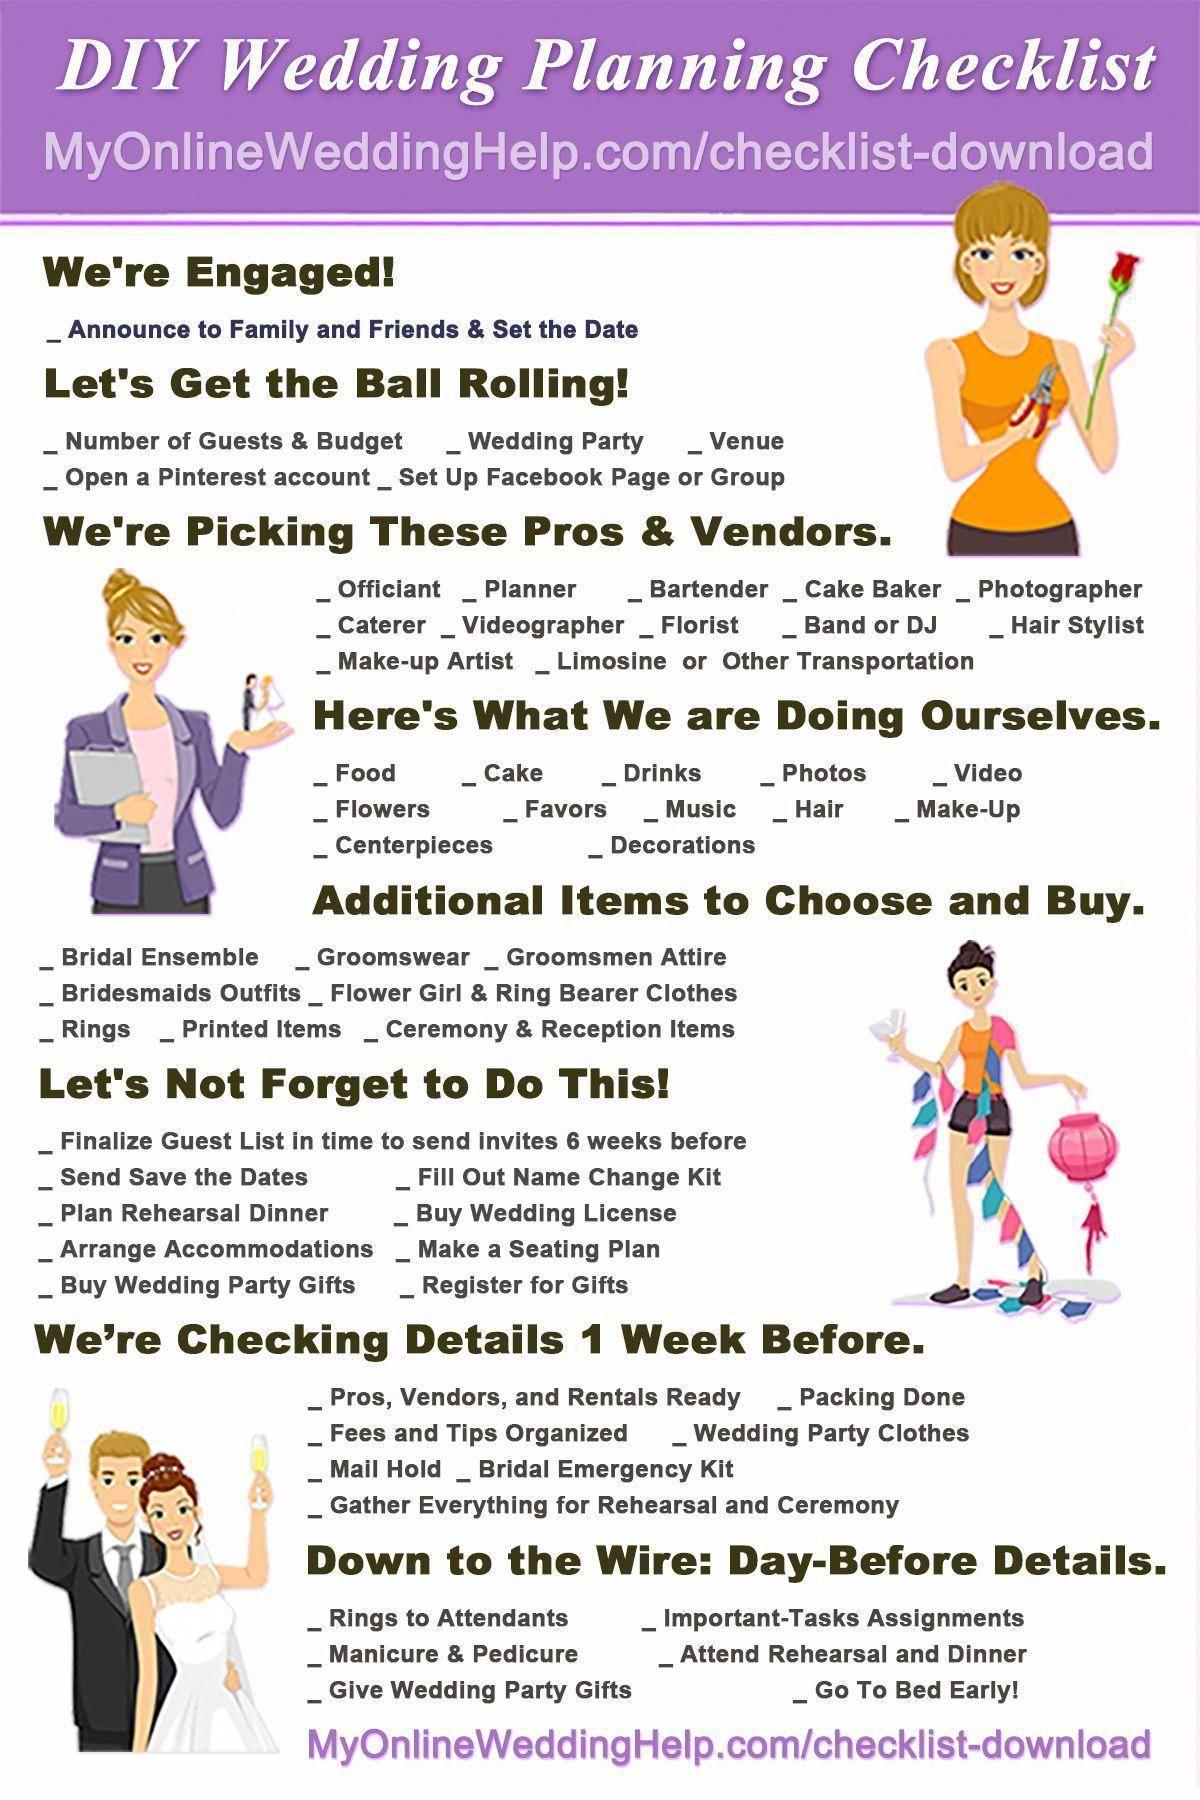 Free Printable Wedding Checklist Unlike Other Check Lists